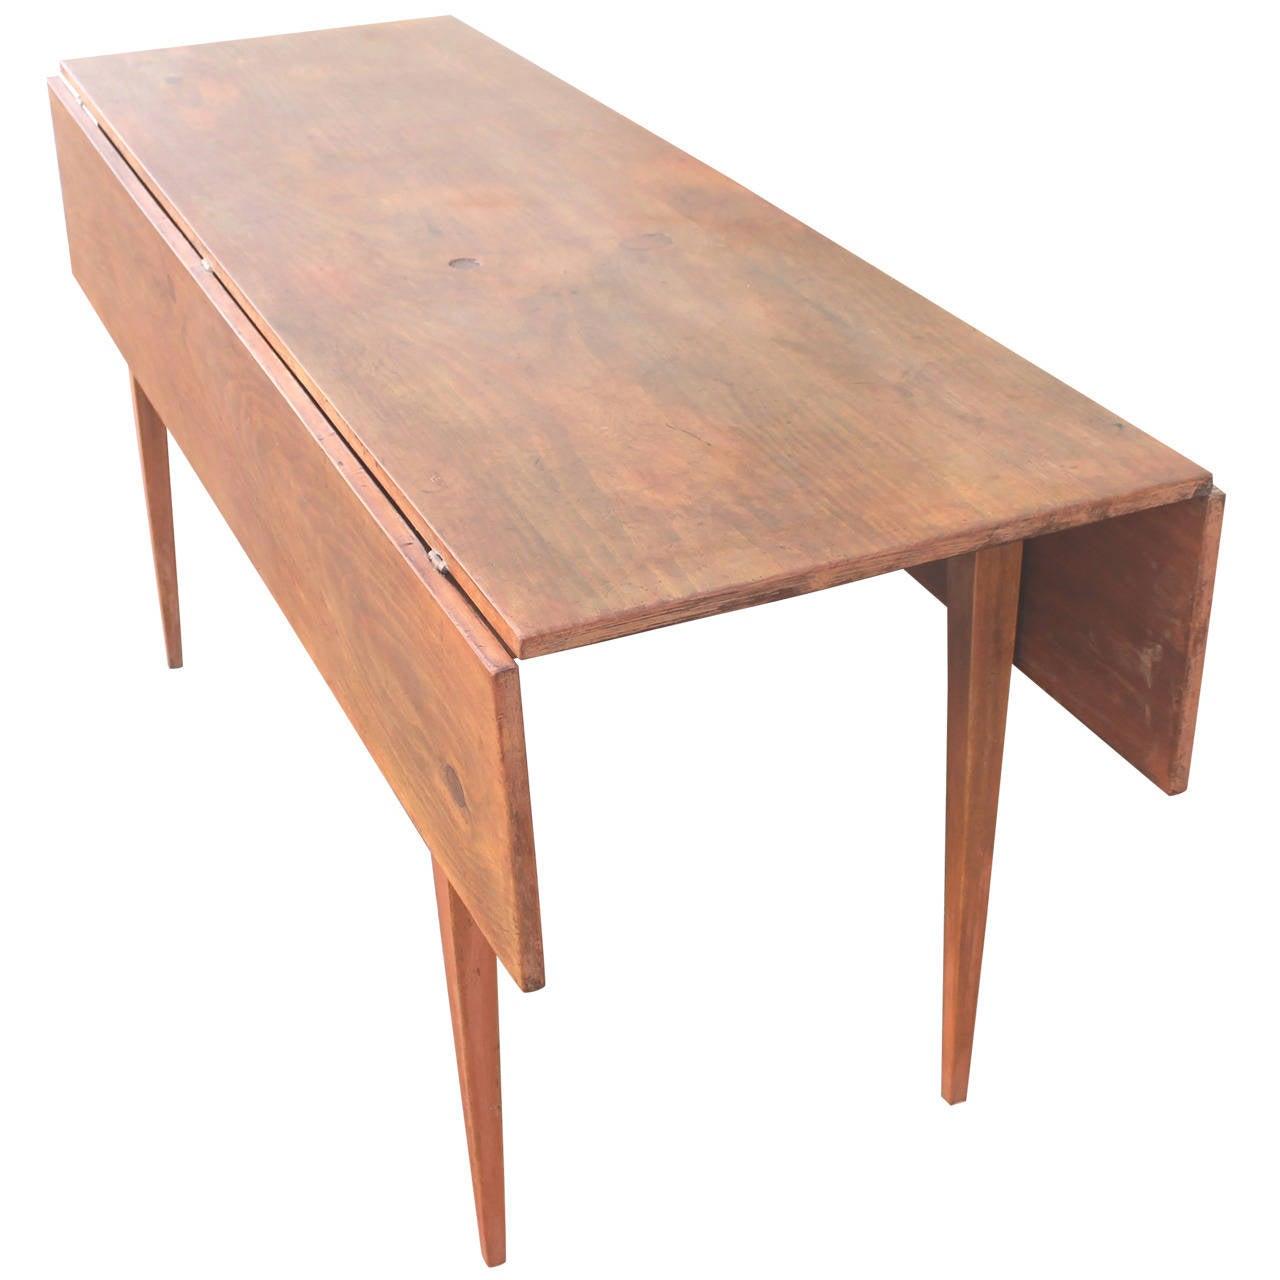 19th Century Original Salmon Painted Farm Table